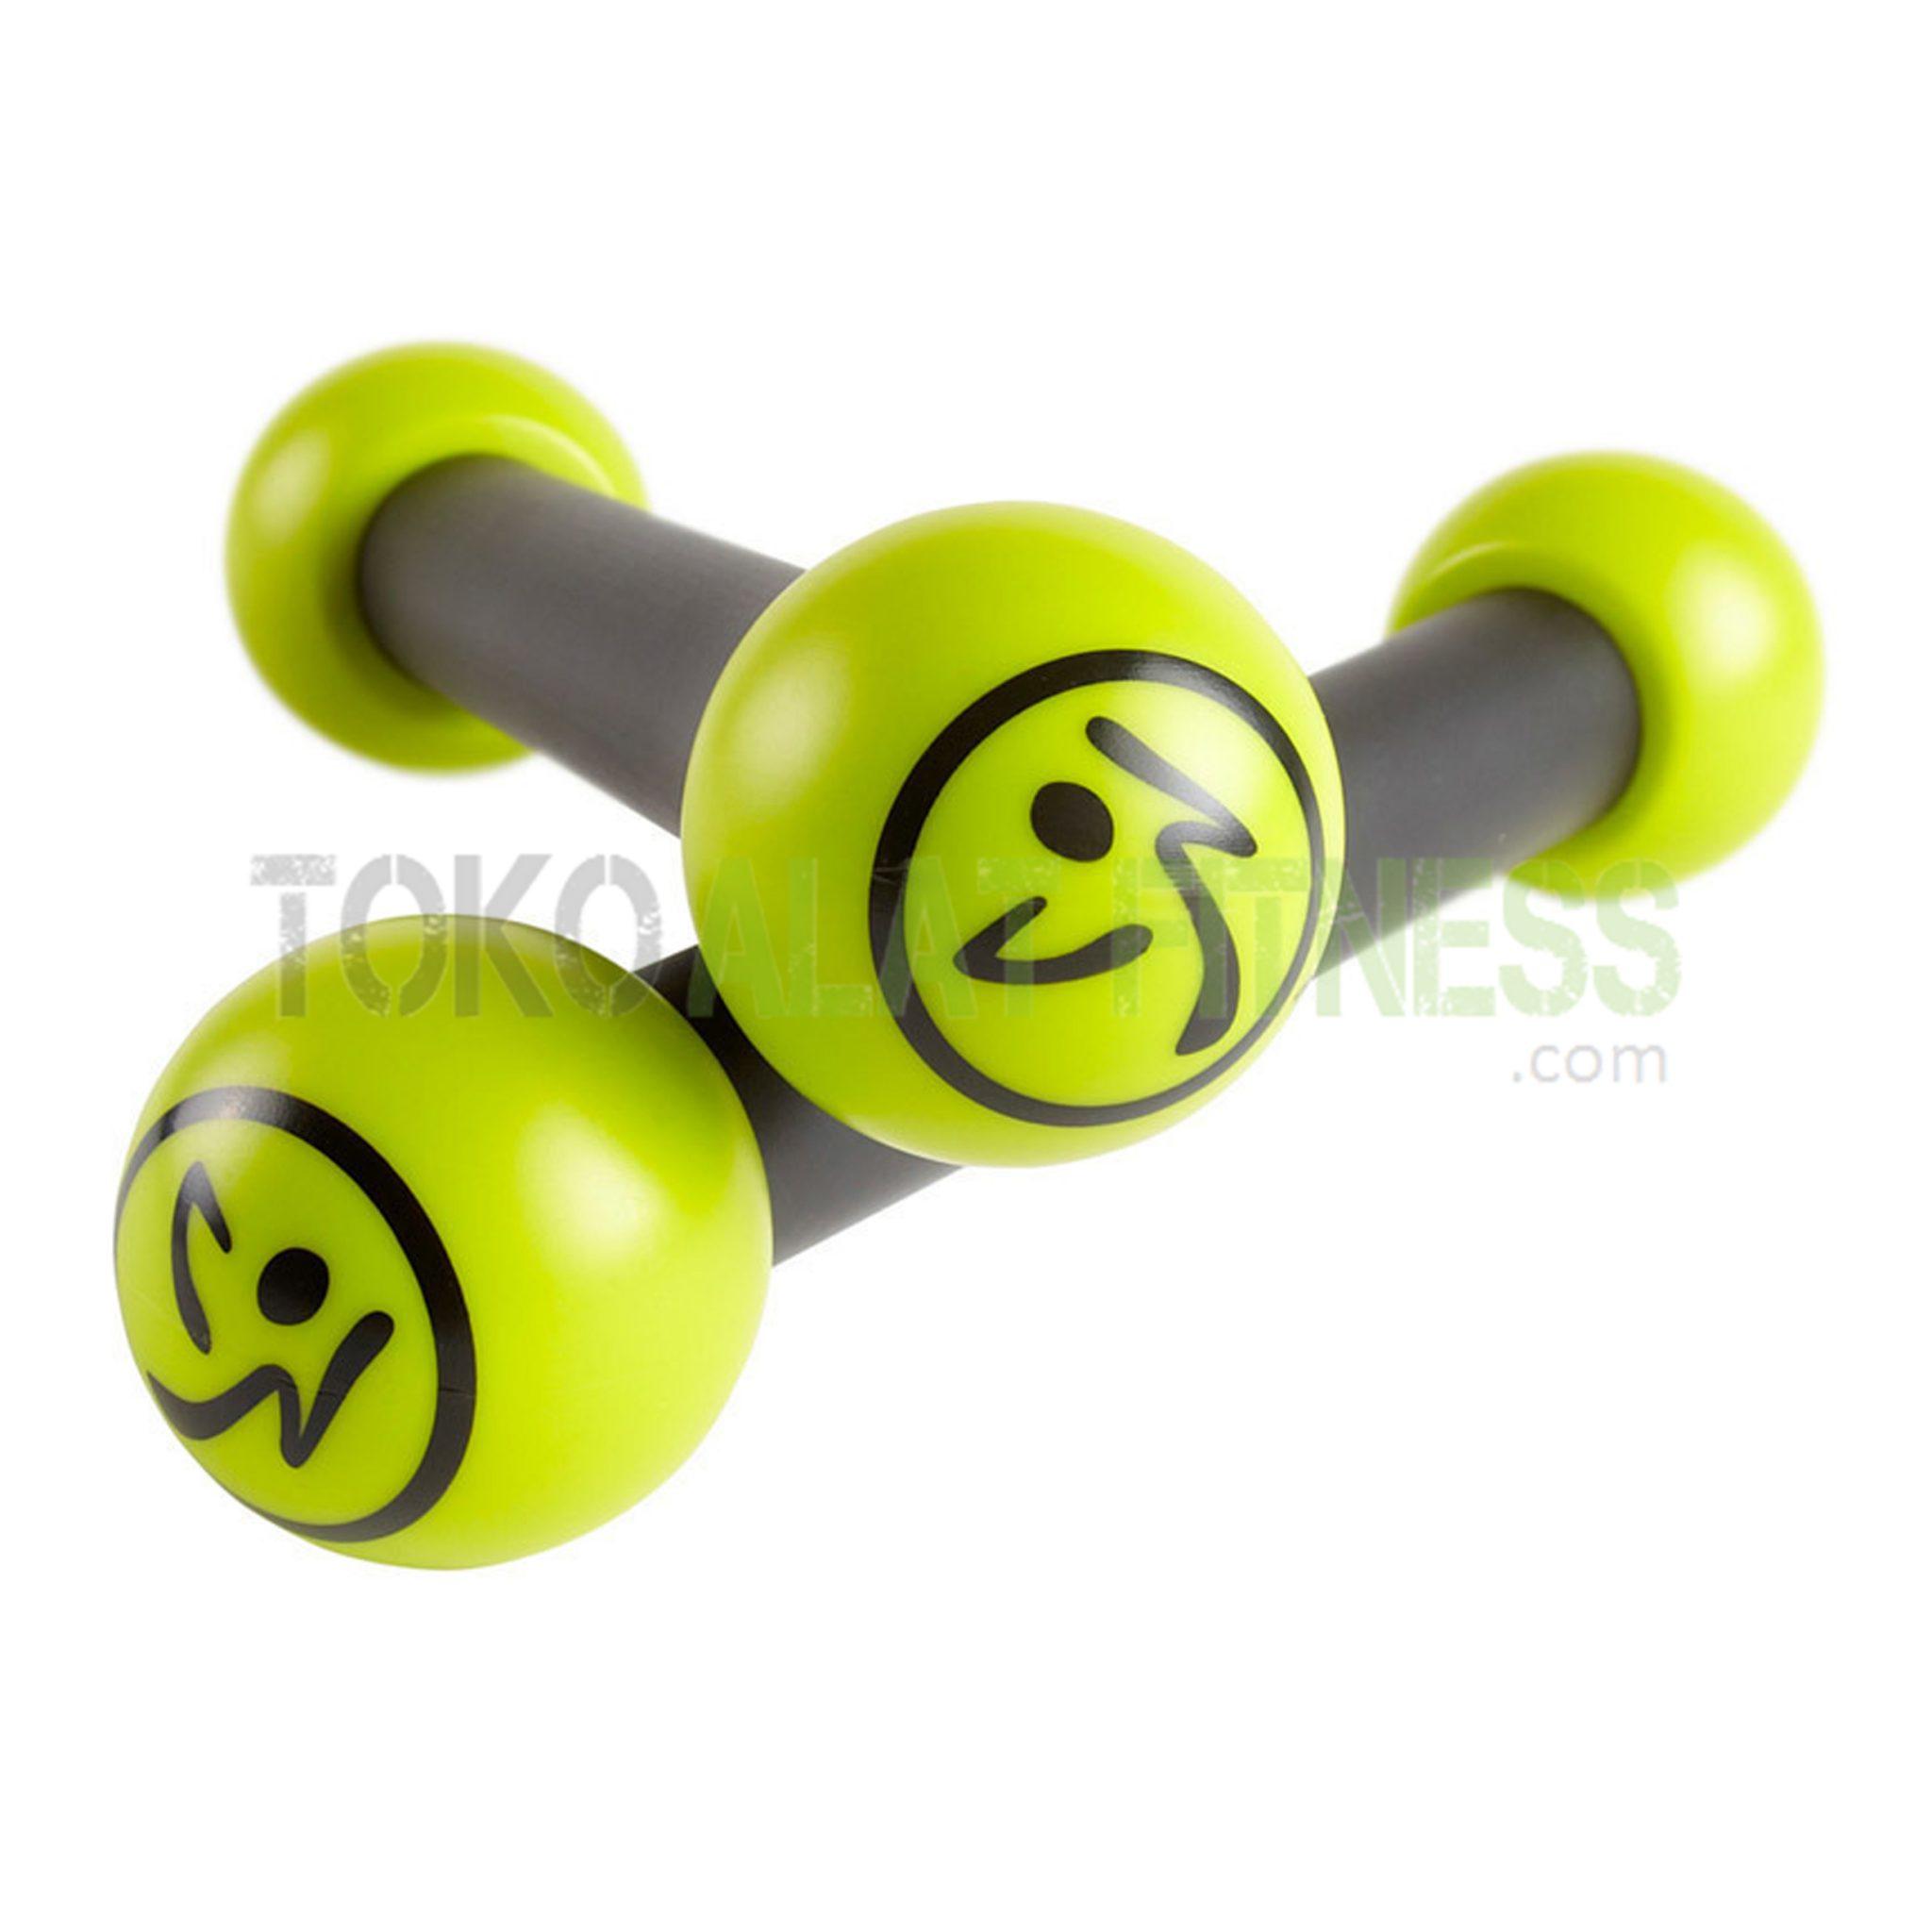 4 - Zumba Fitness Exhilarate Box Contents Set Body Gym